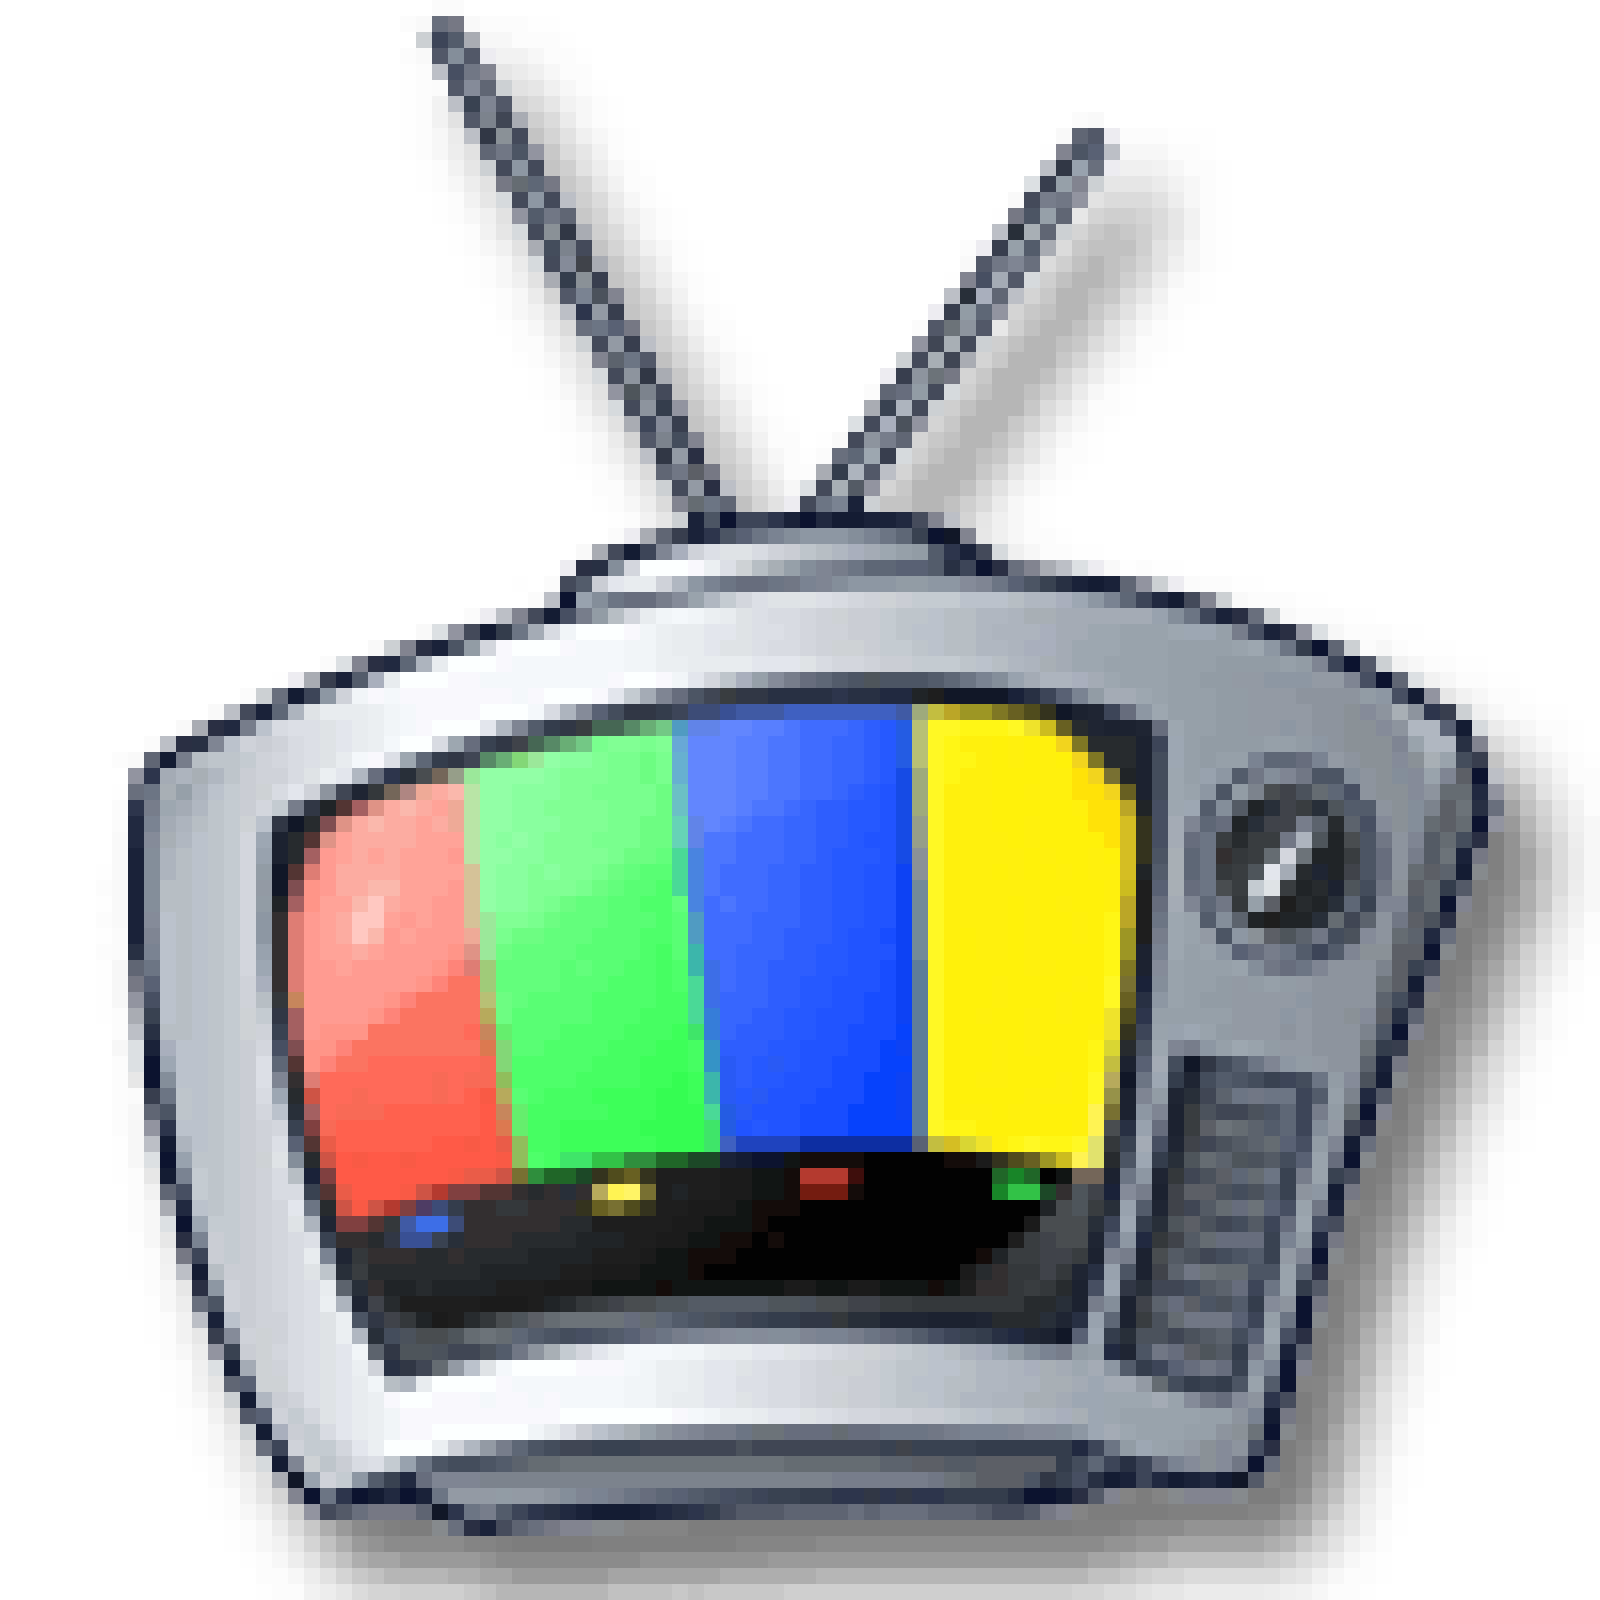 InternetTV